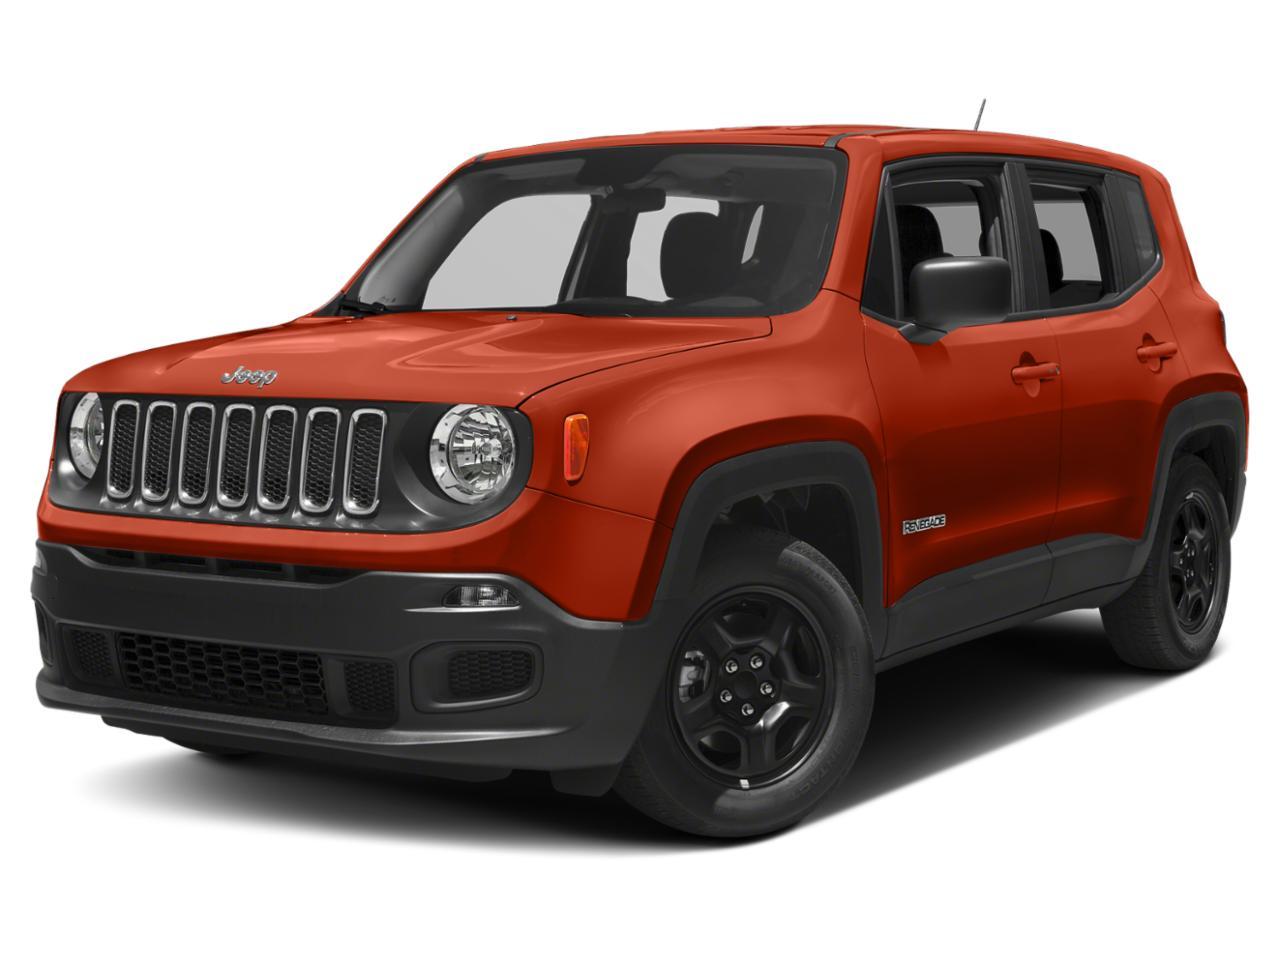 2018 Jeep Renegade Vehicle Photo in Johnson City, TN 37601